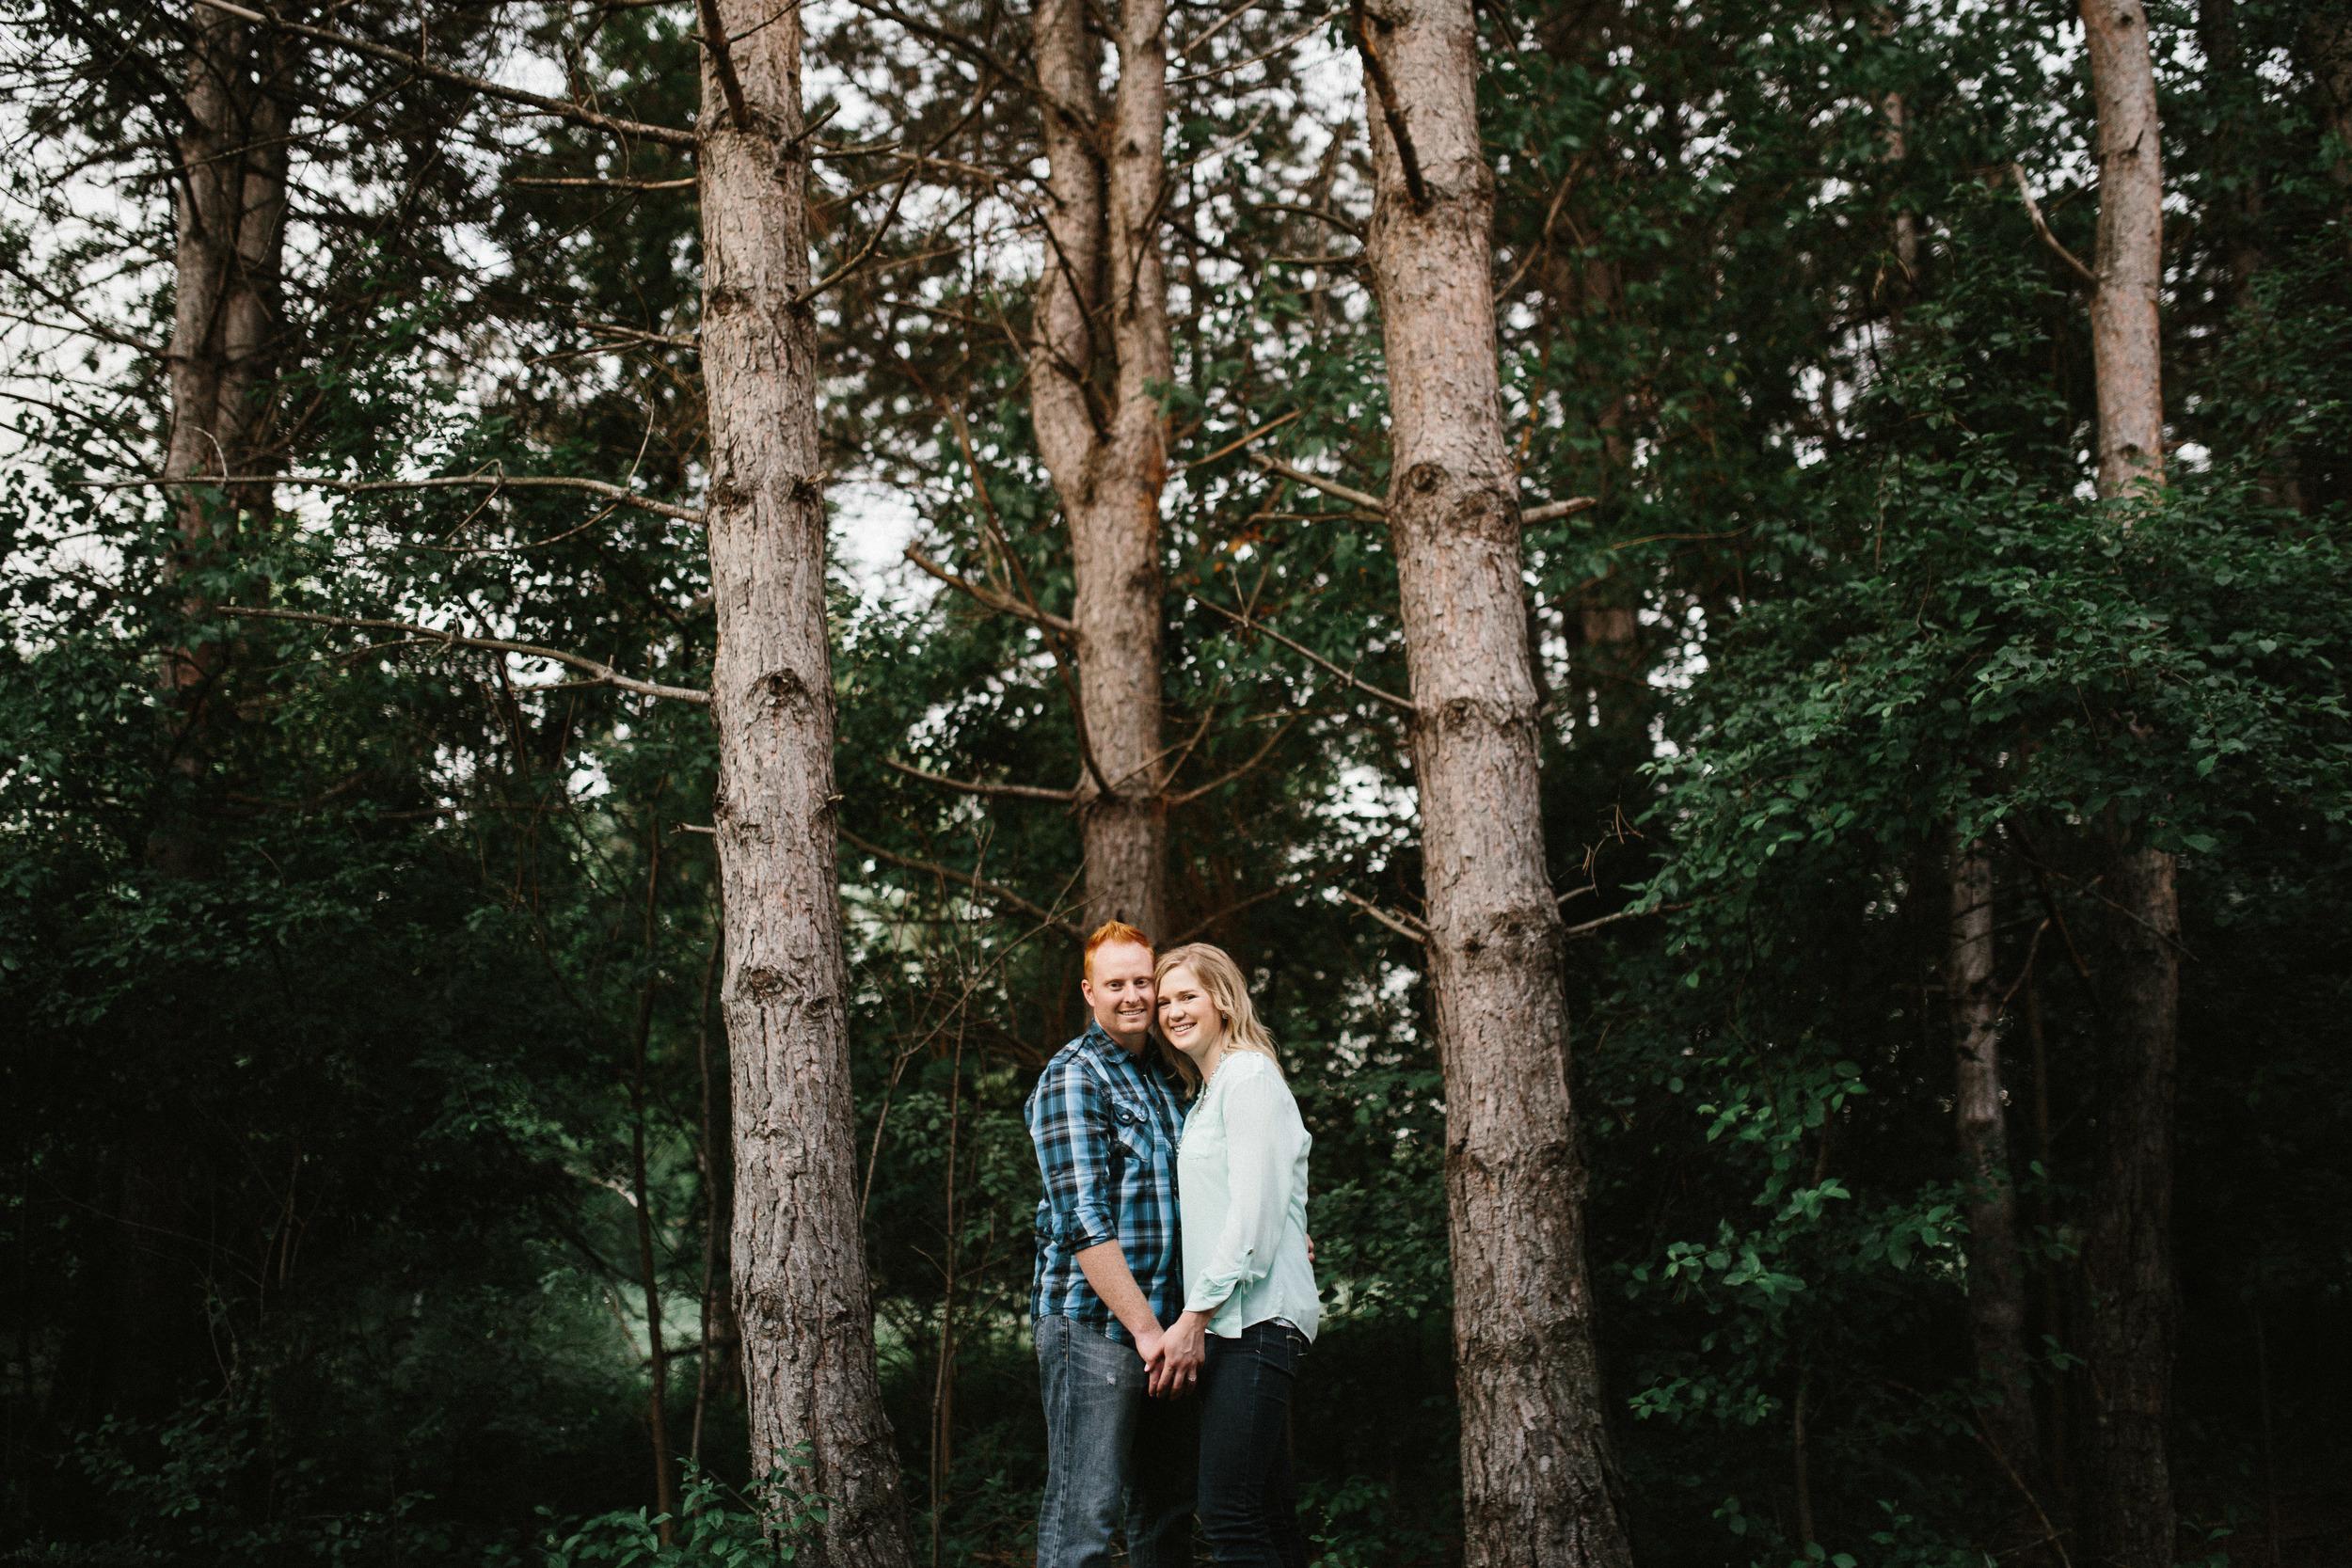 Thomas&Heidi_Engagement_119.jpg